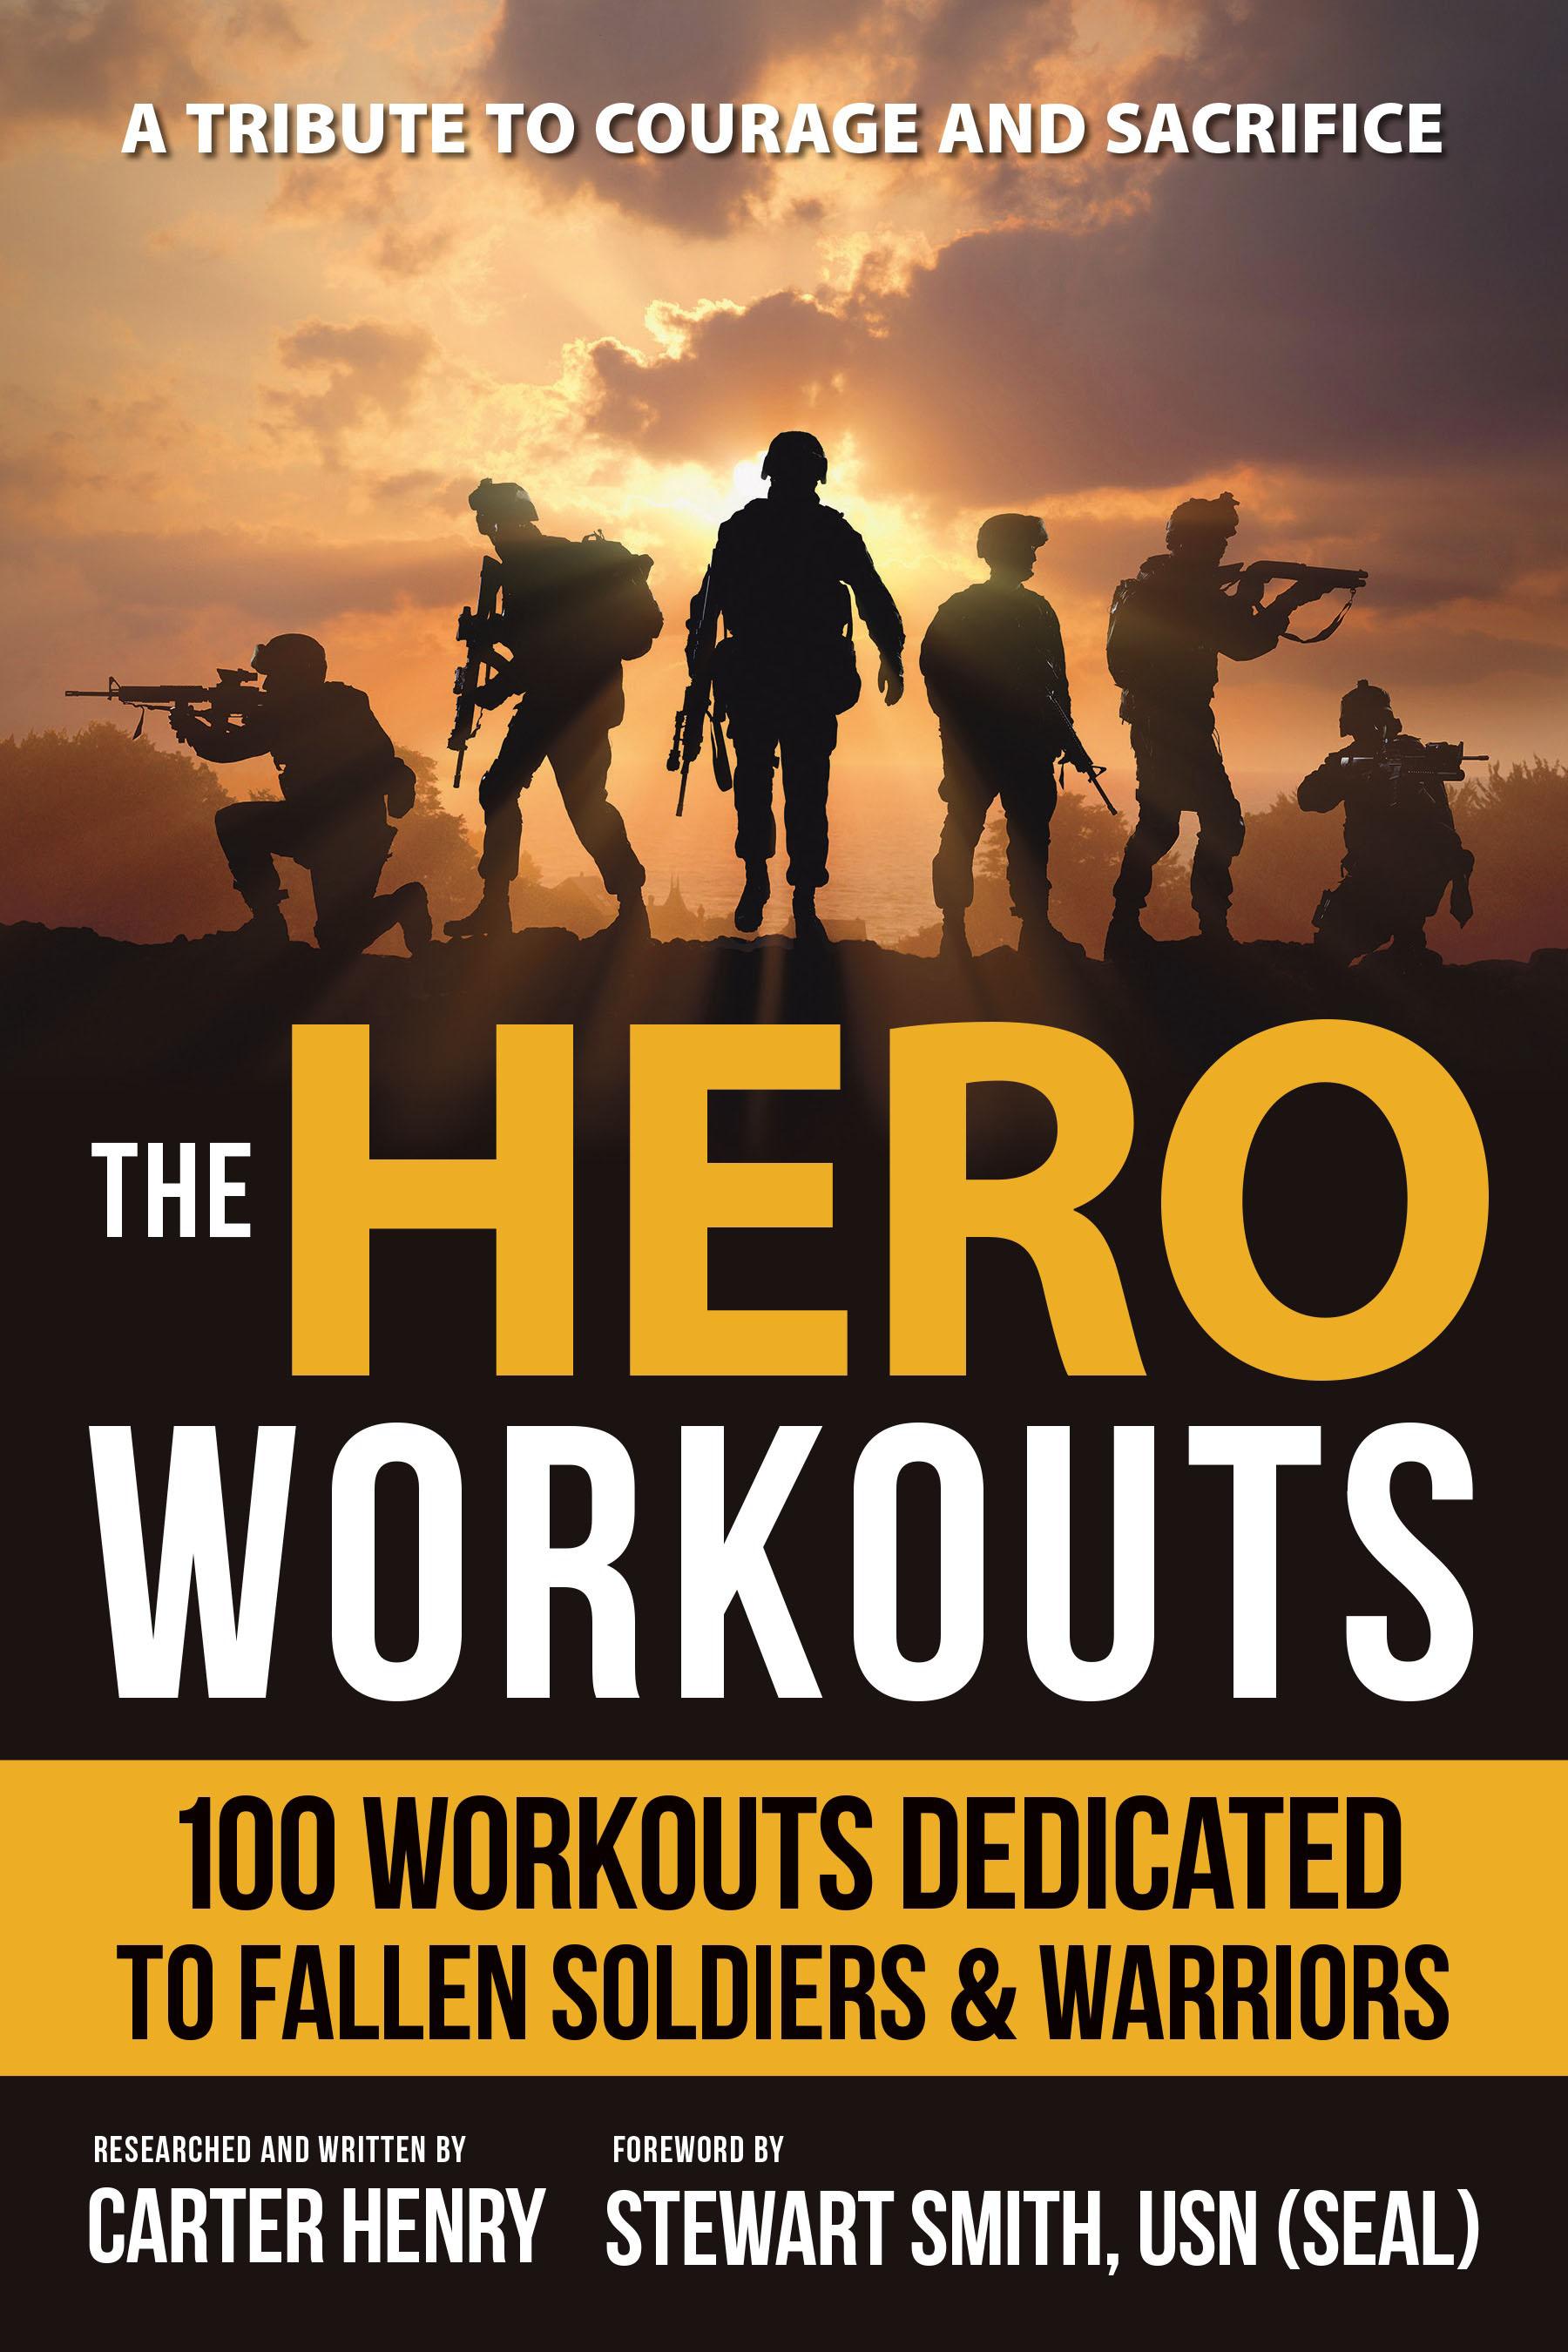 The Hero Workouts compendium